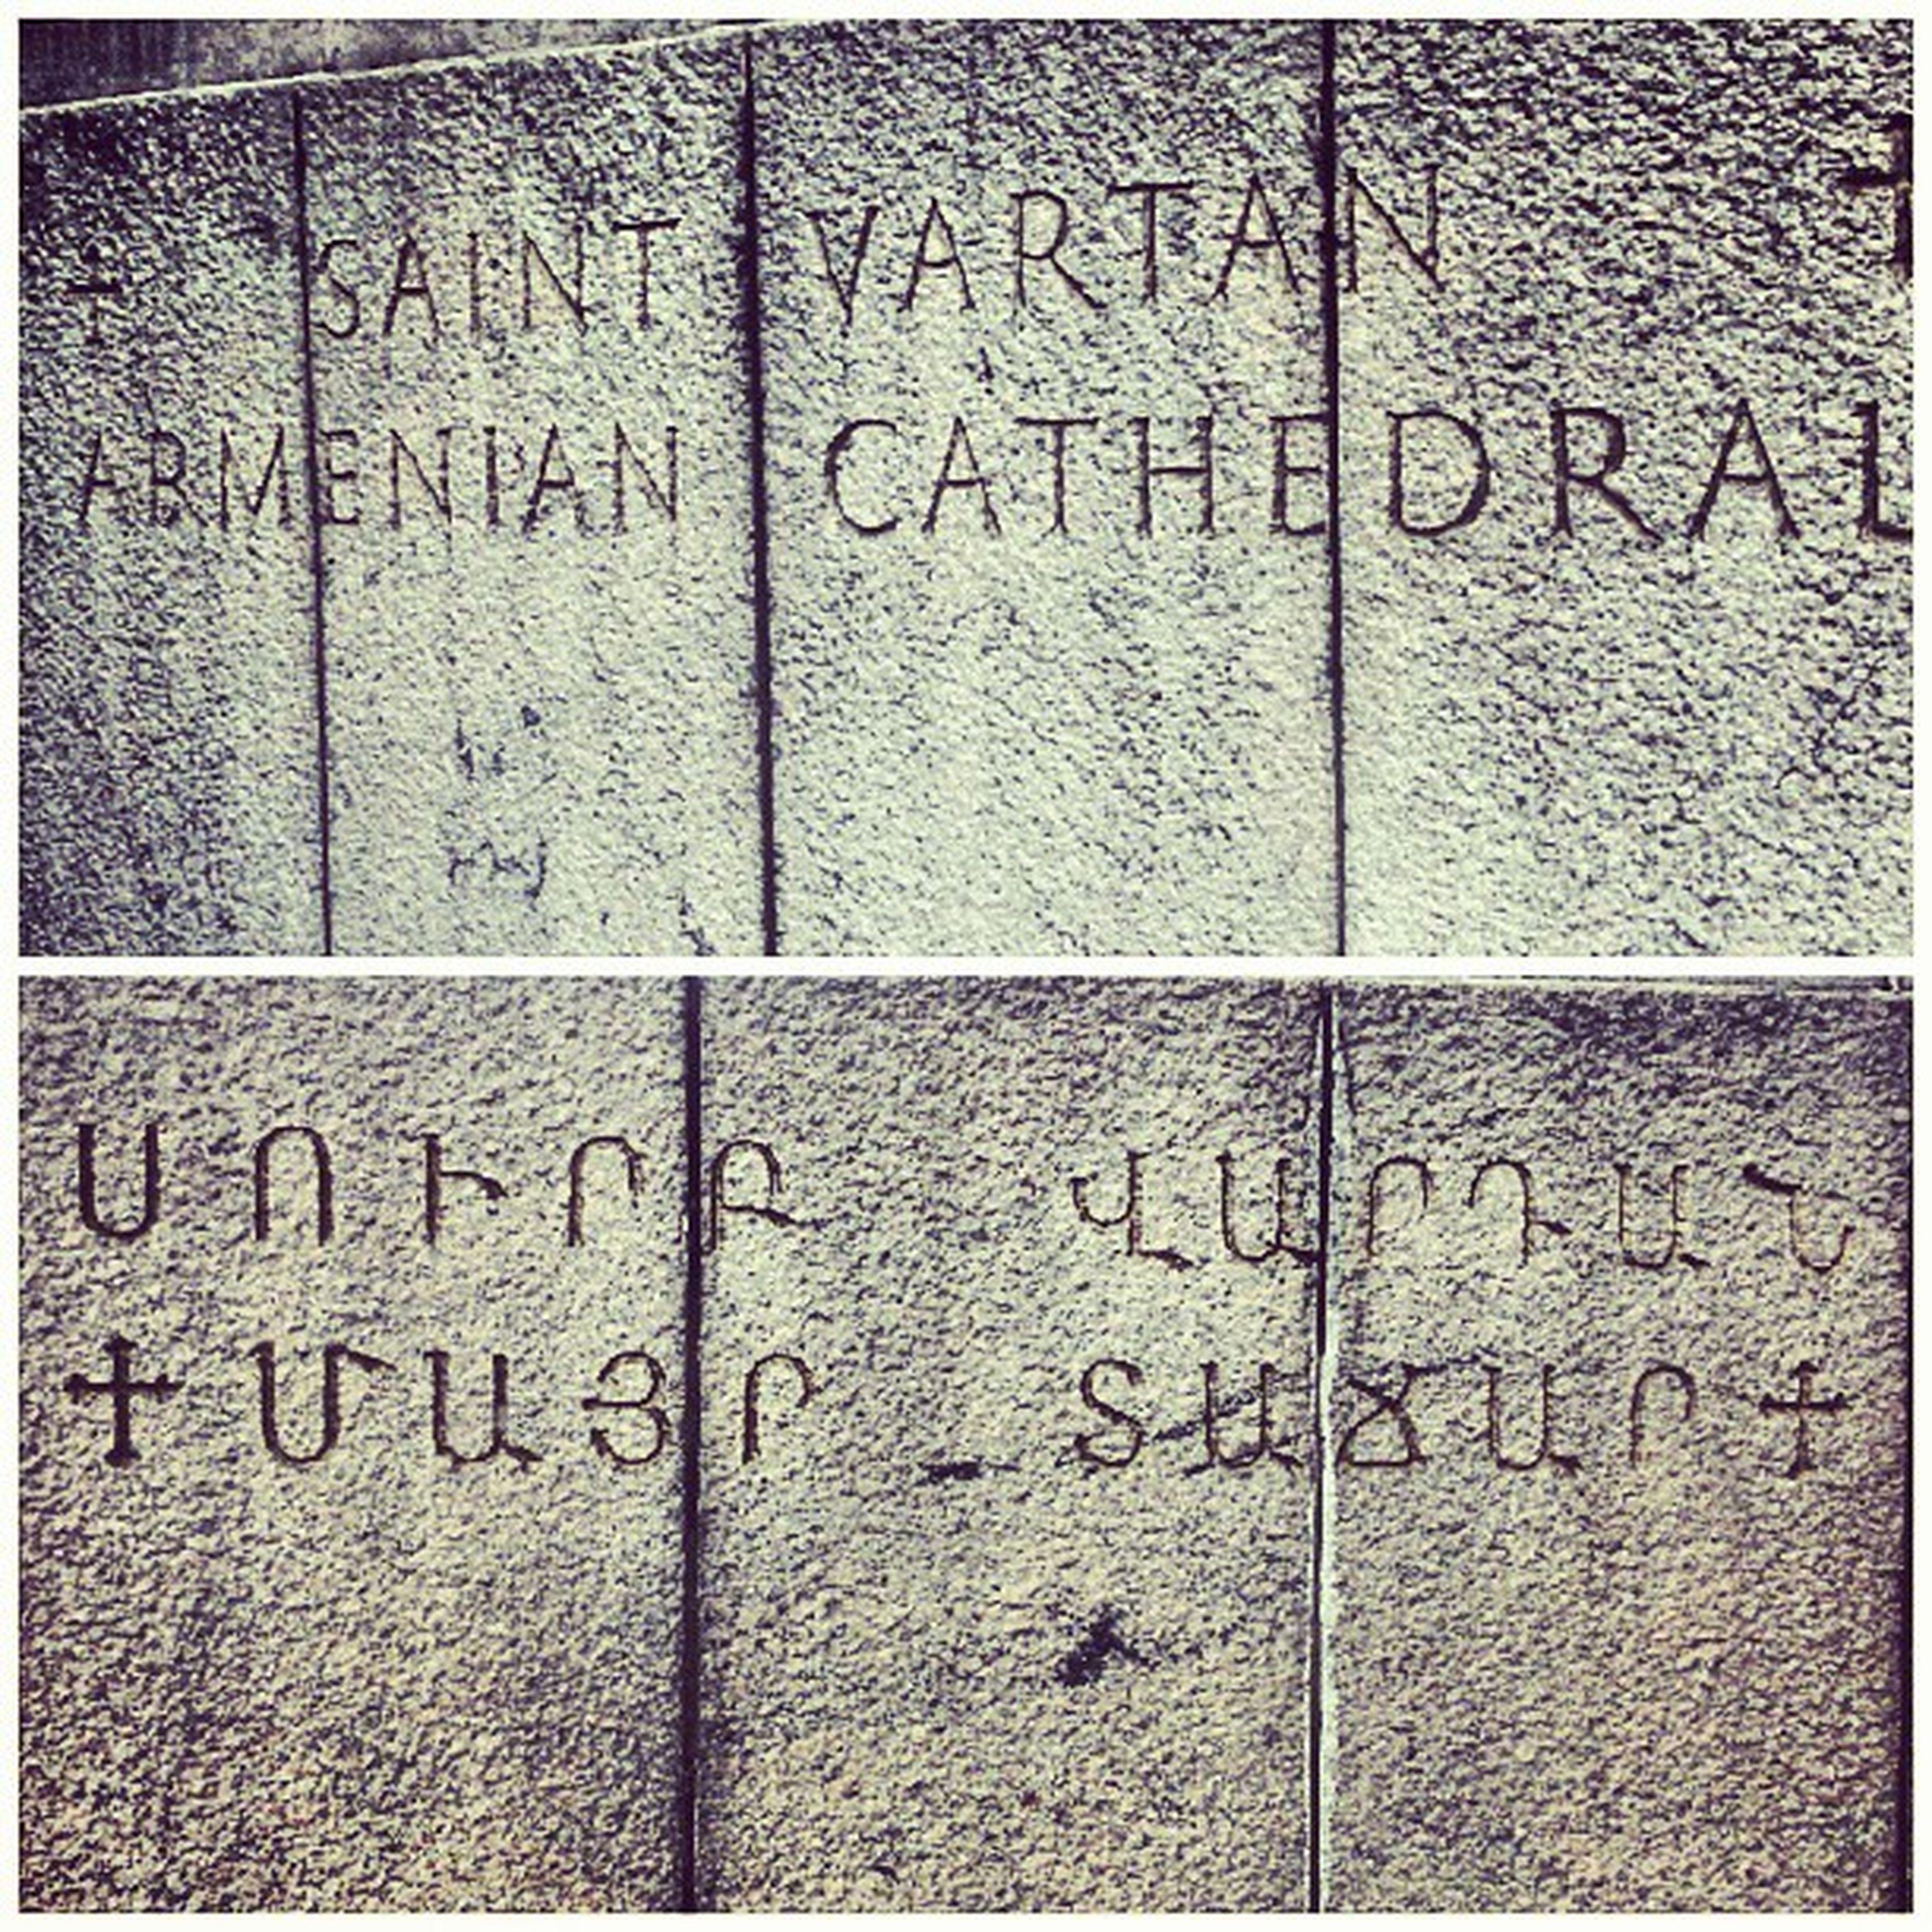 Special for @armo_djan Armenia Newyork Cathedral